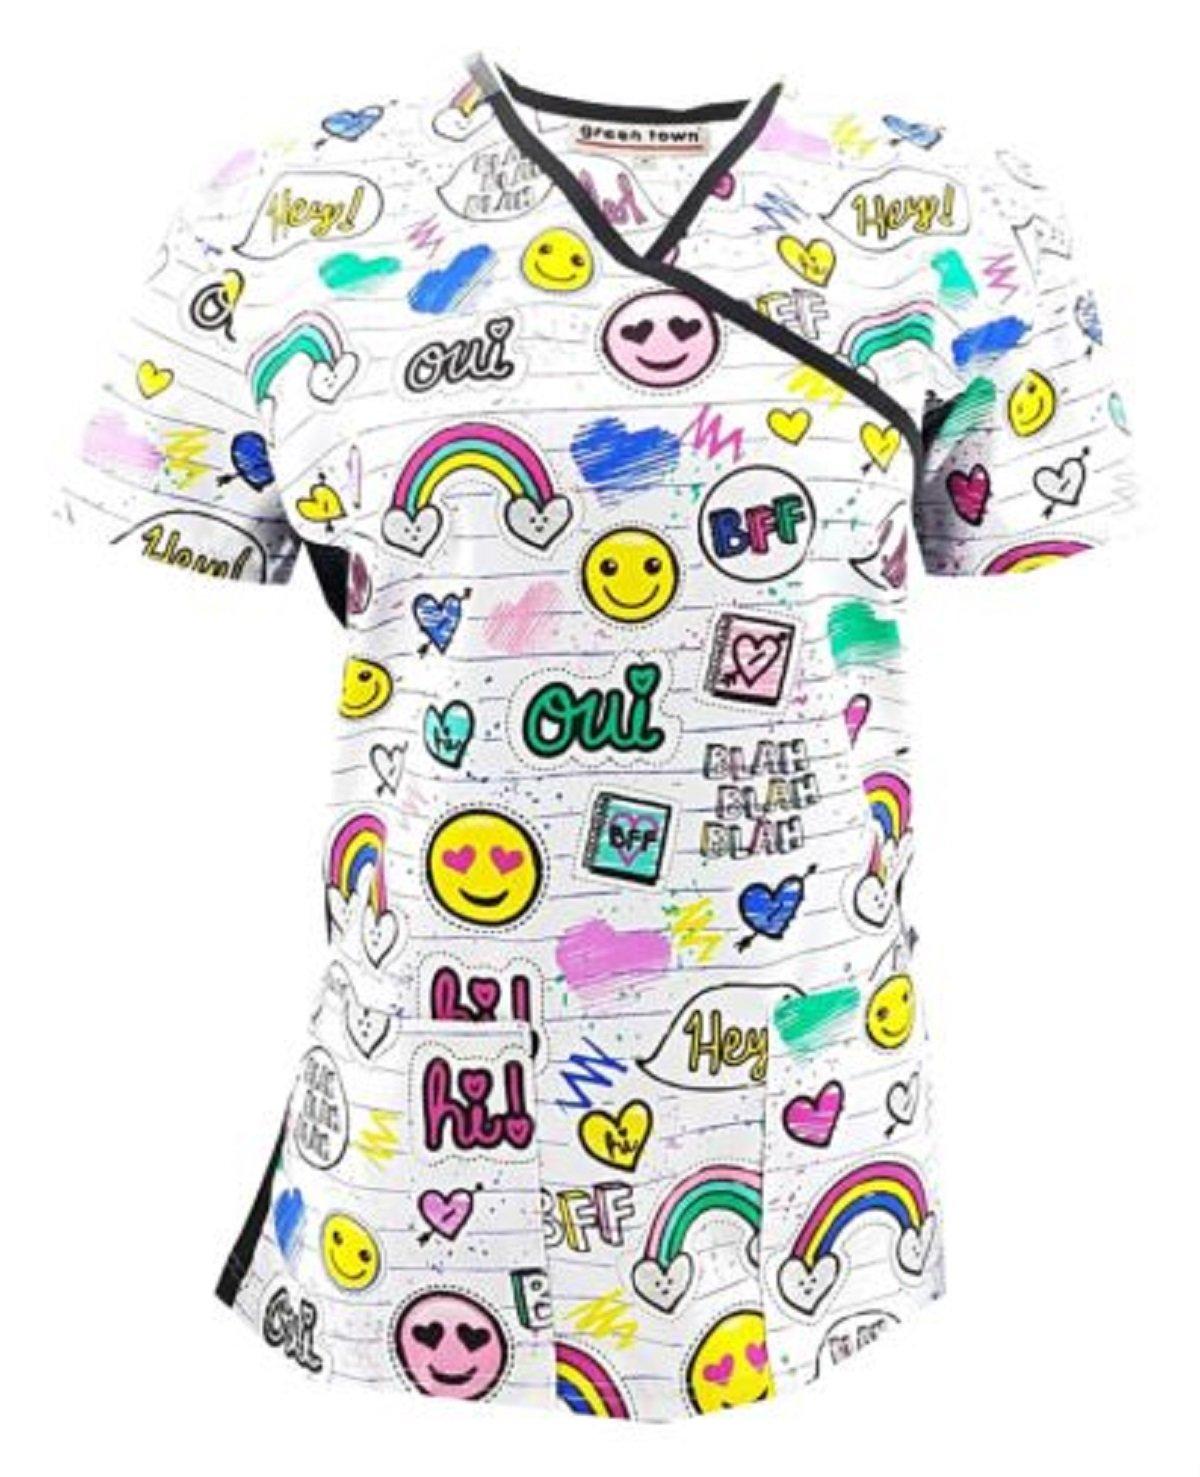 Zikit NY Women's Printed Nursing Medical Scrub TOP Plus Sizes XS S M L 1X 2X 3X 4X (S, Hearts)